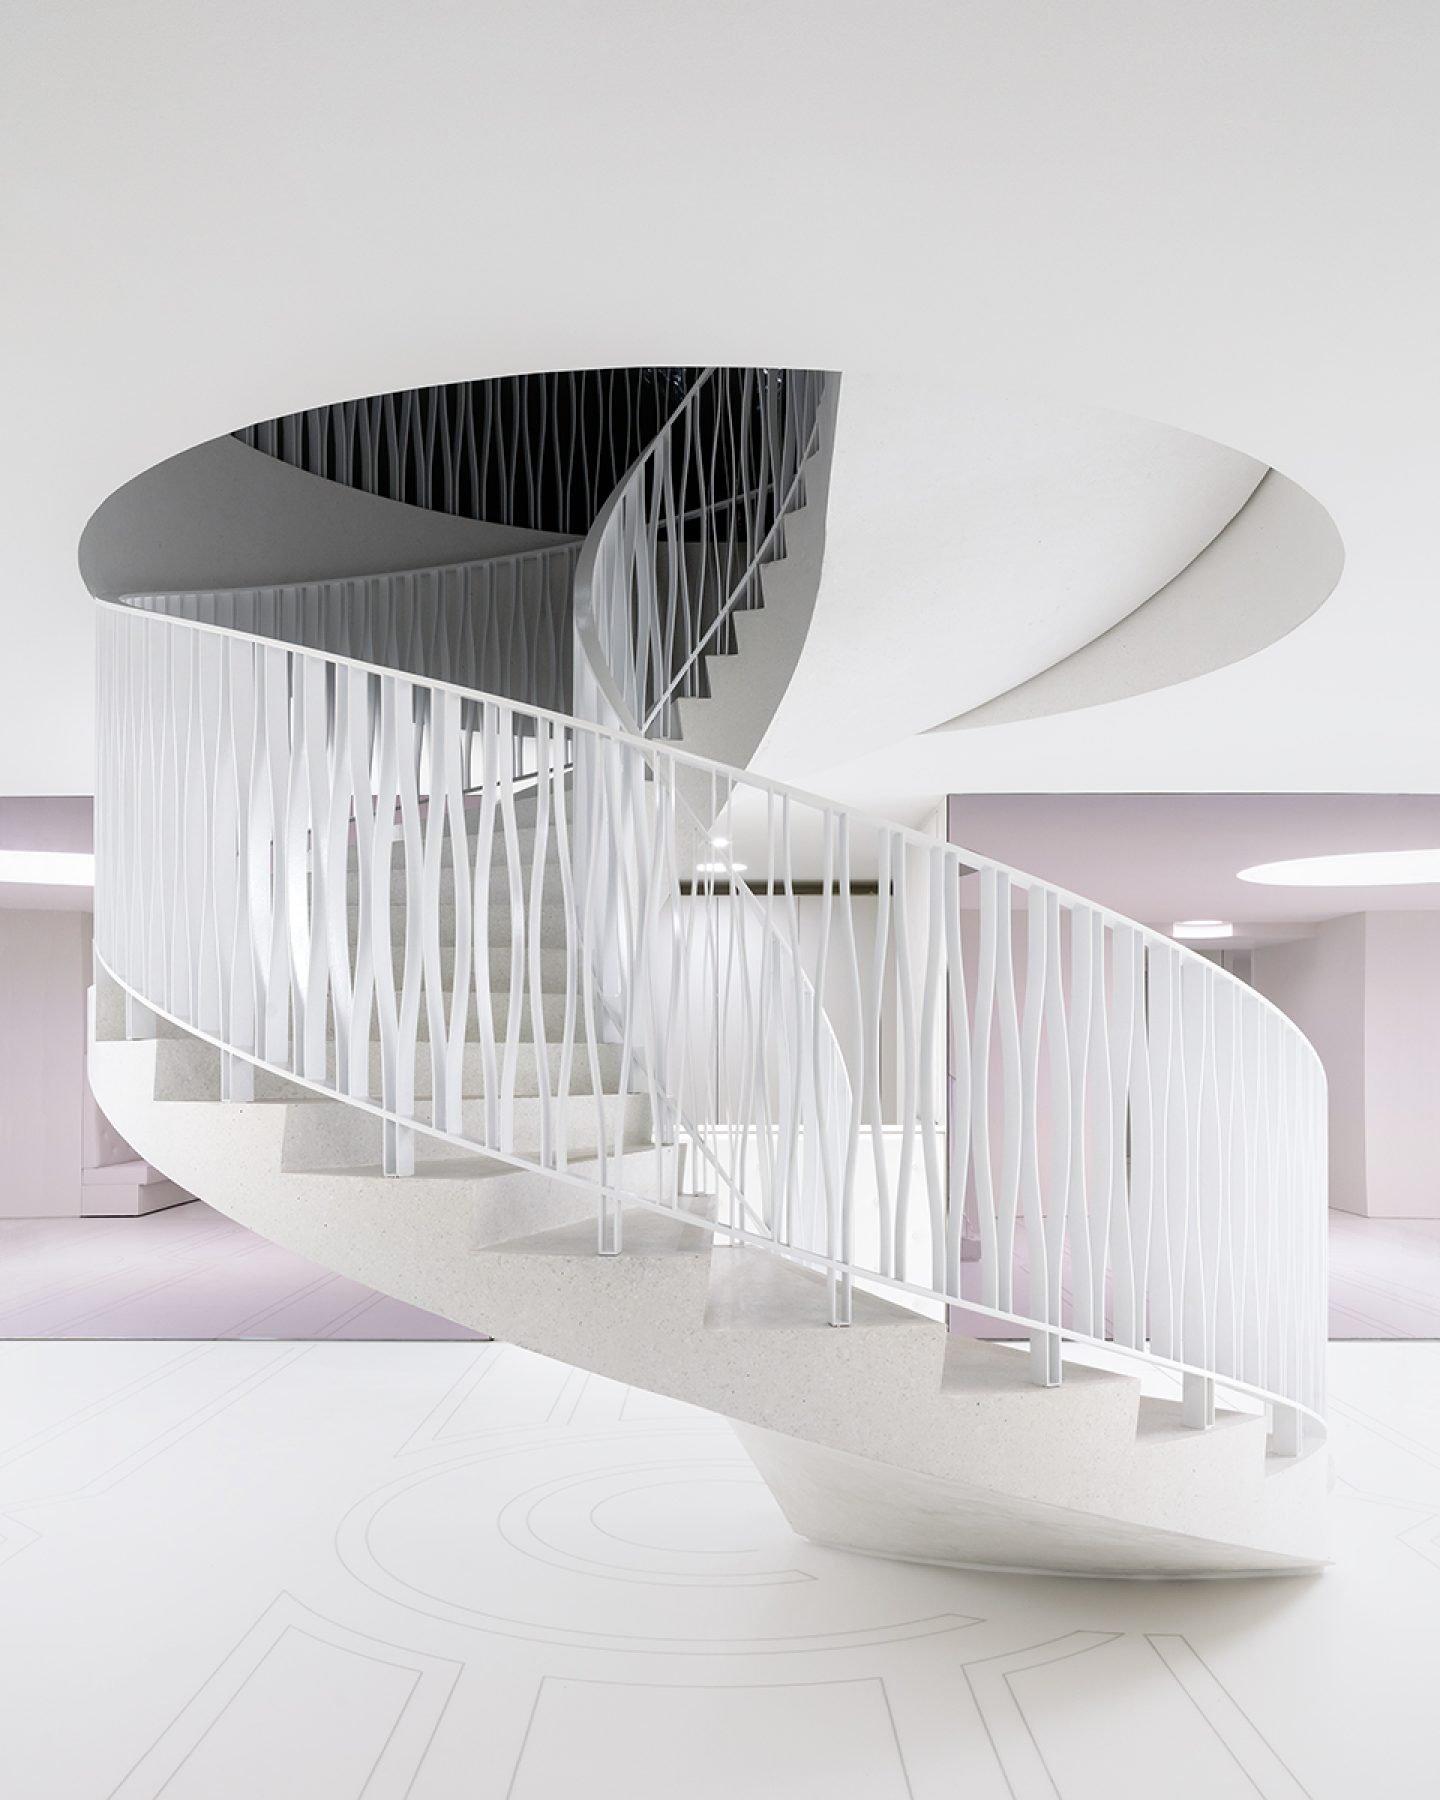 IGNANT-Travel-Kaan-Architekten-KMSKA-04